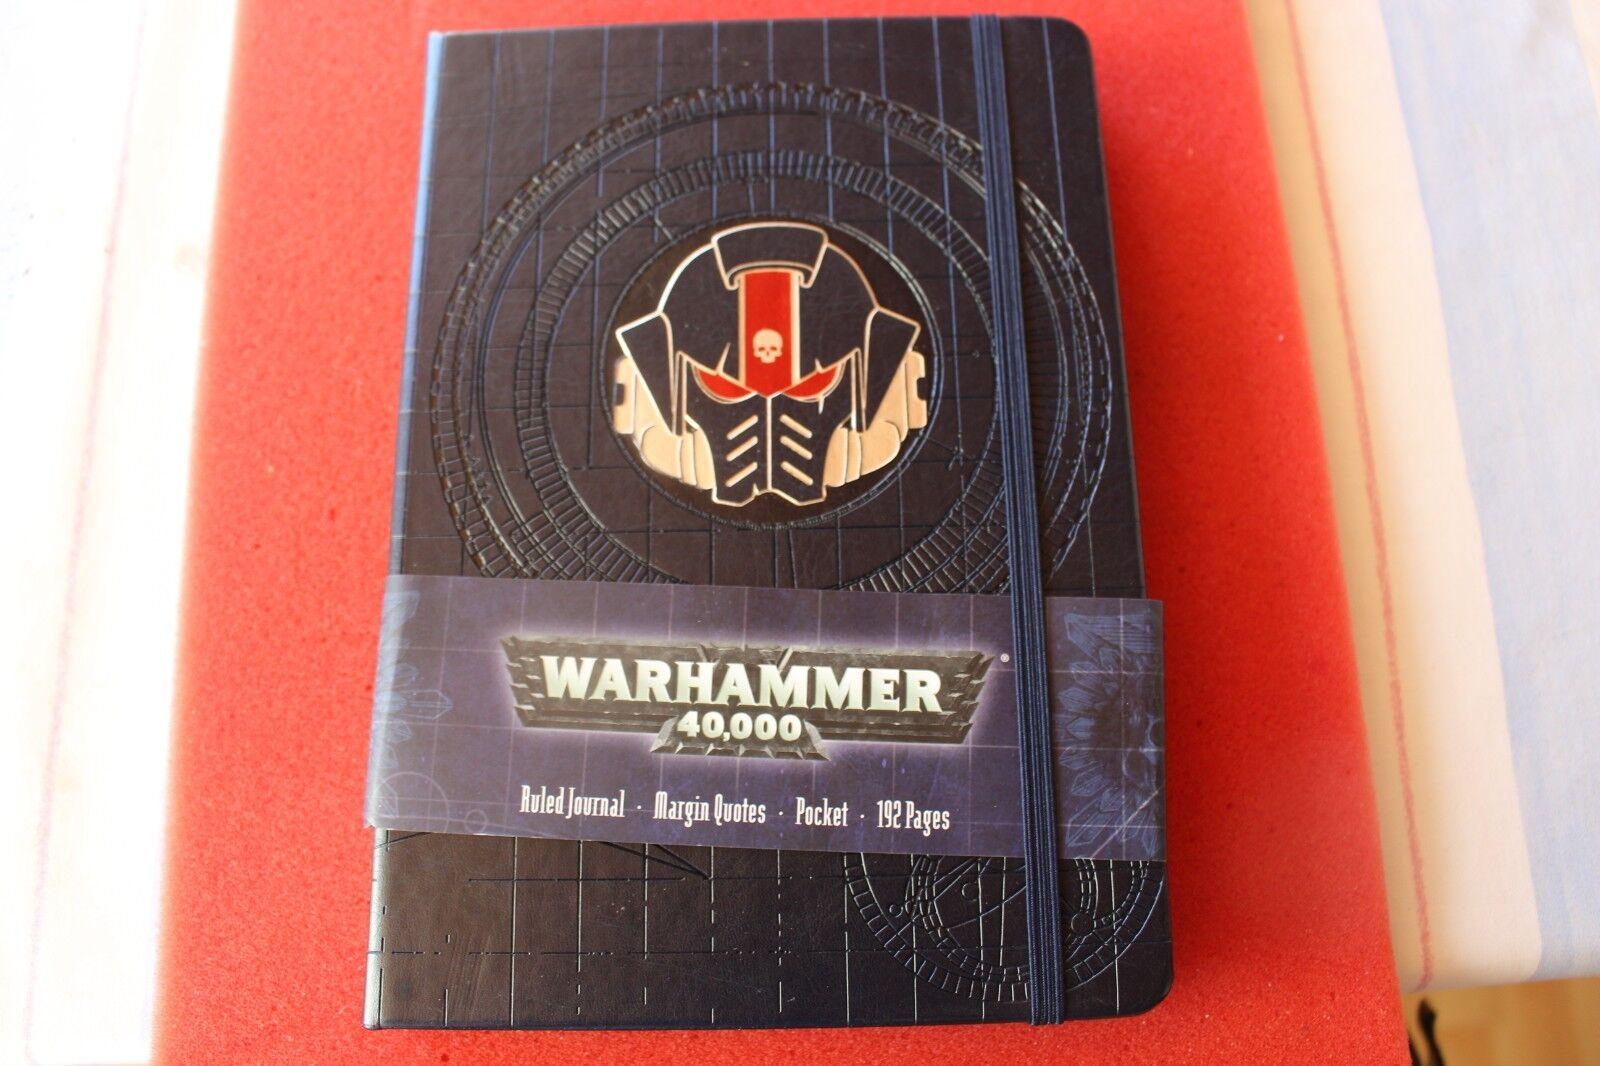 Games Workshop Warhammer 40k Ruled Journal BNIB New Margin Quotes Space Marines